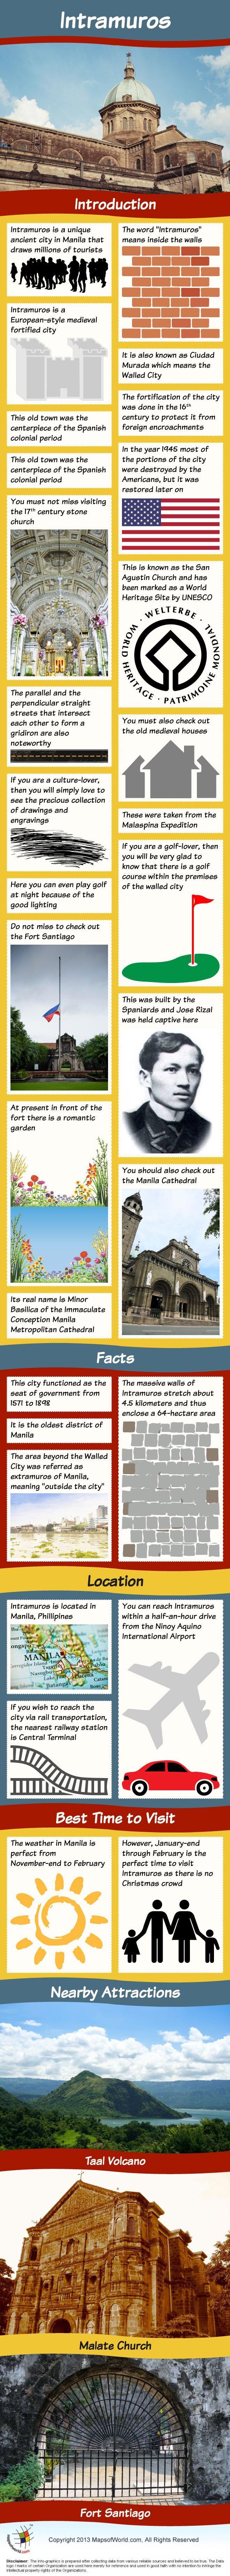 Intramuros, Philippines Infographic